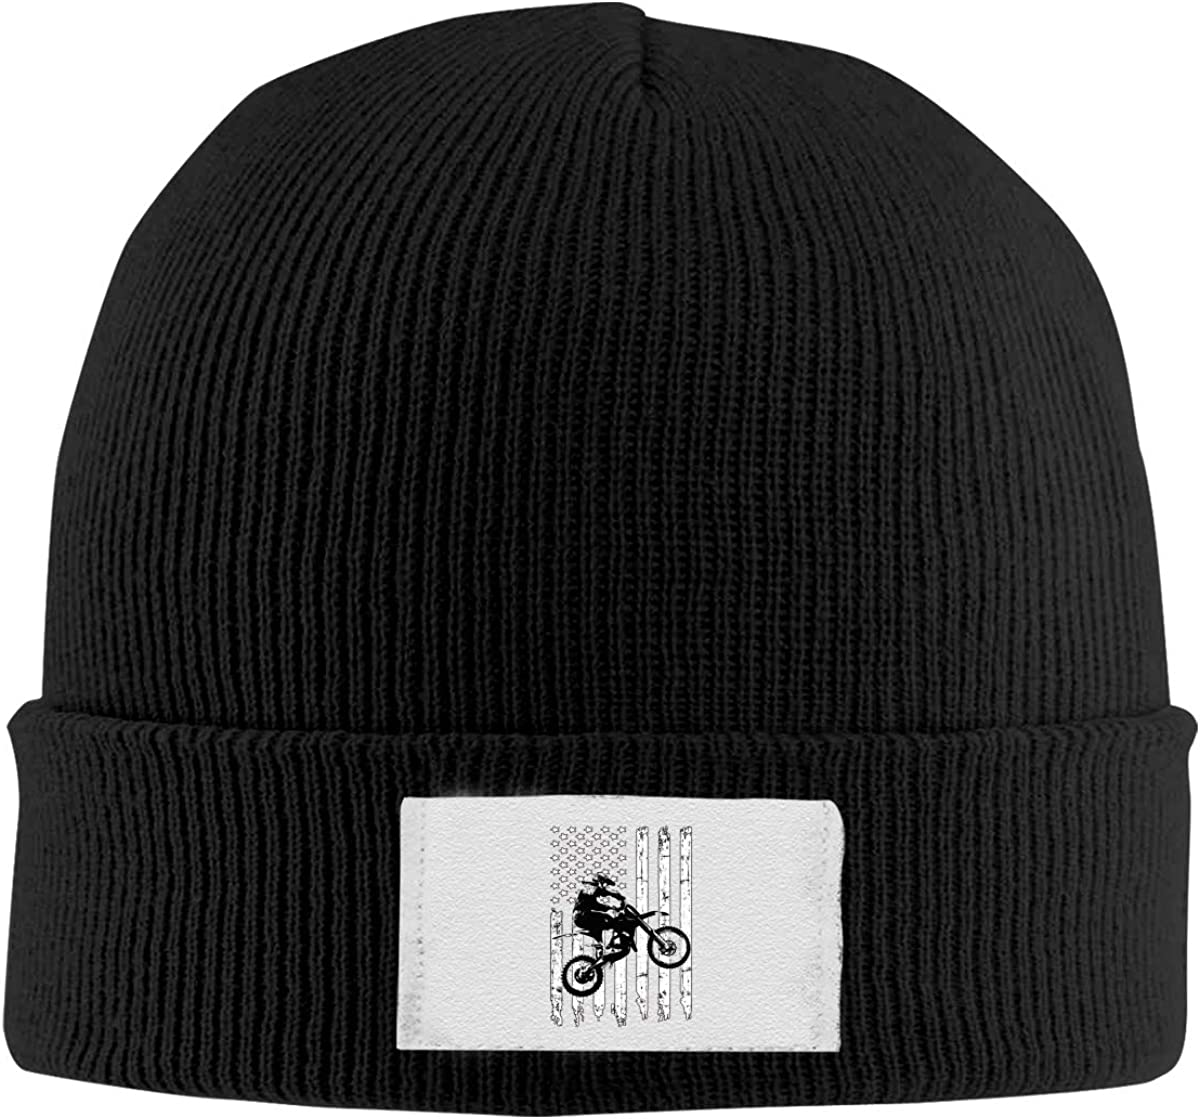 Skull Caps Motocross Dirt Bike Winter Warm Knit Hats Stretchy Cuff Beanie Hat Black